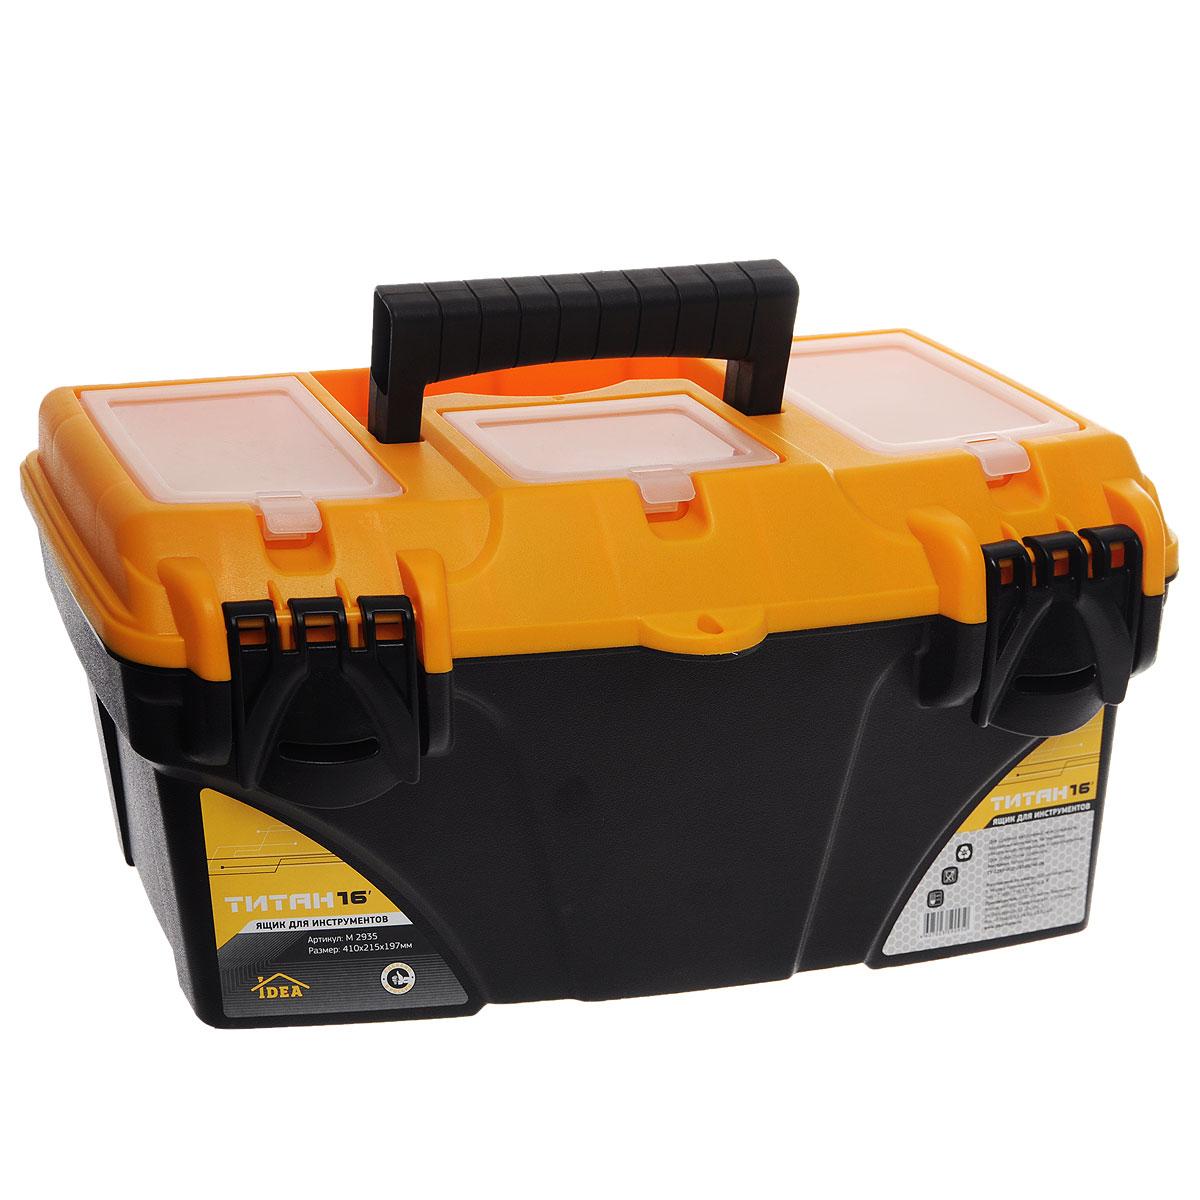 "Idea (М-пластика) Ящик для инструментов Idea ""Титан 16"", с органайзером, 41 х 21,5 х 19,7 см"